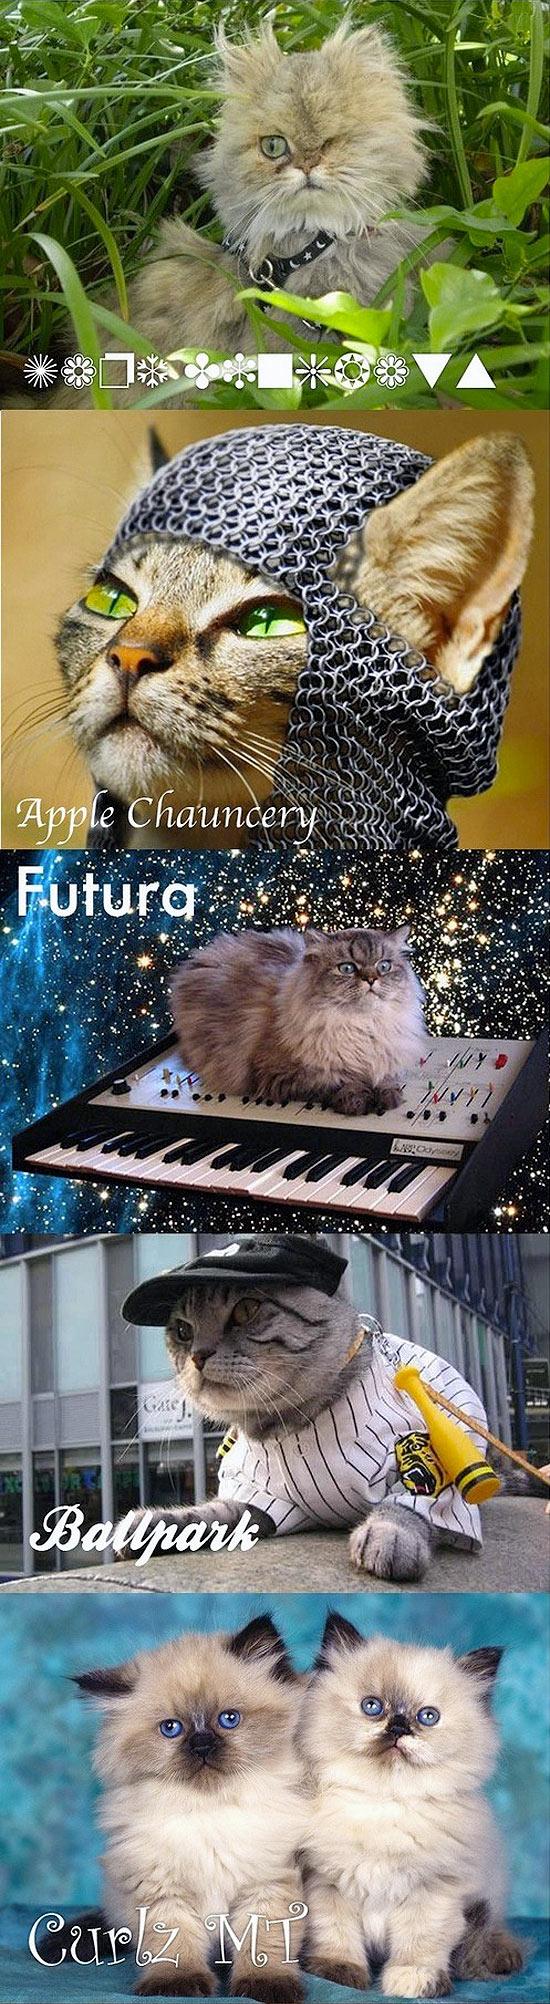 Les chats & les typos : Dings, Futura, Apple